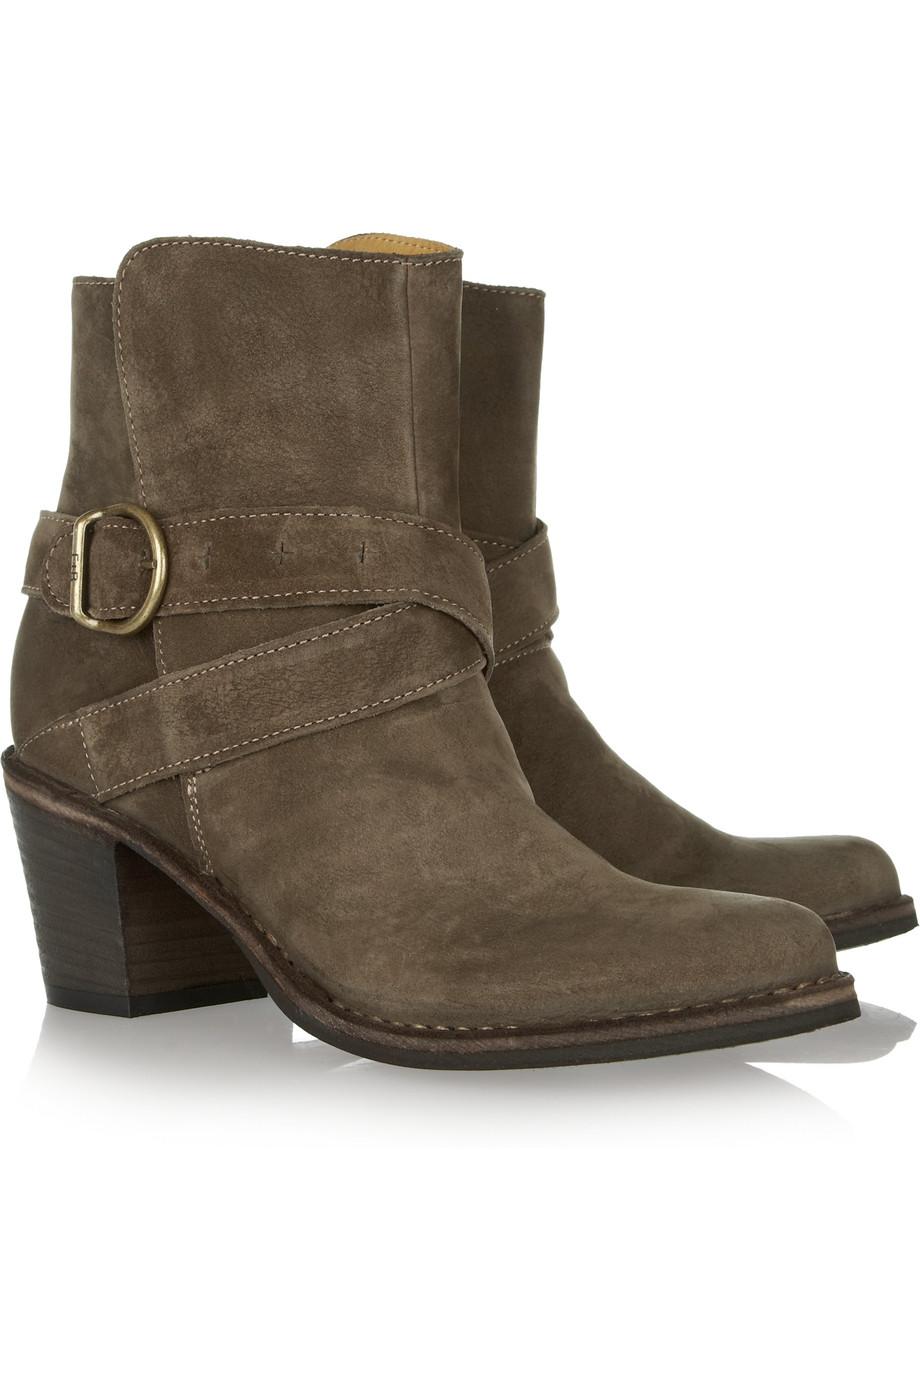 fiorentini baker nubis nolita fabula nubuck boots in brown lyst. Black Bedroom Furniture Sets. Home Design Ideas